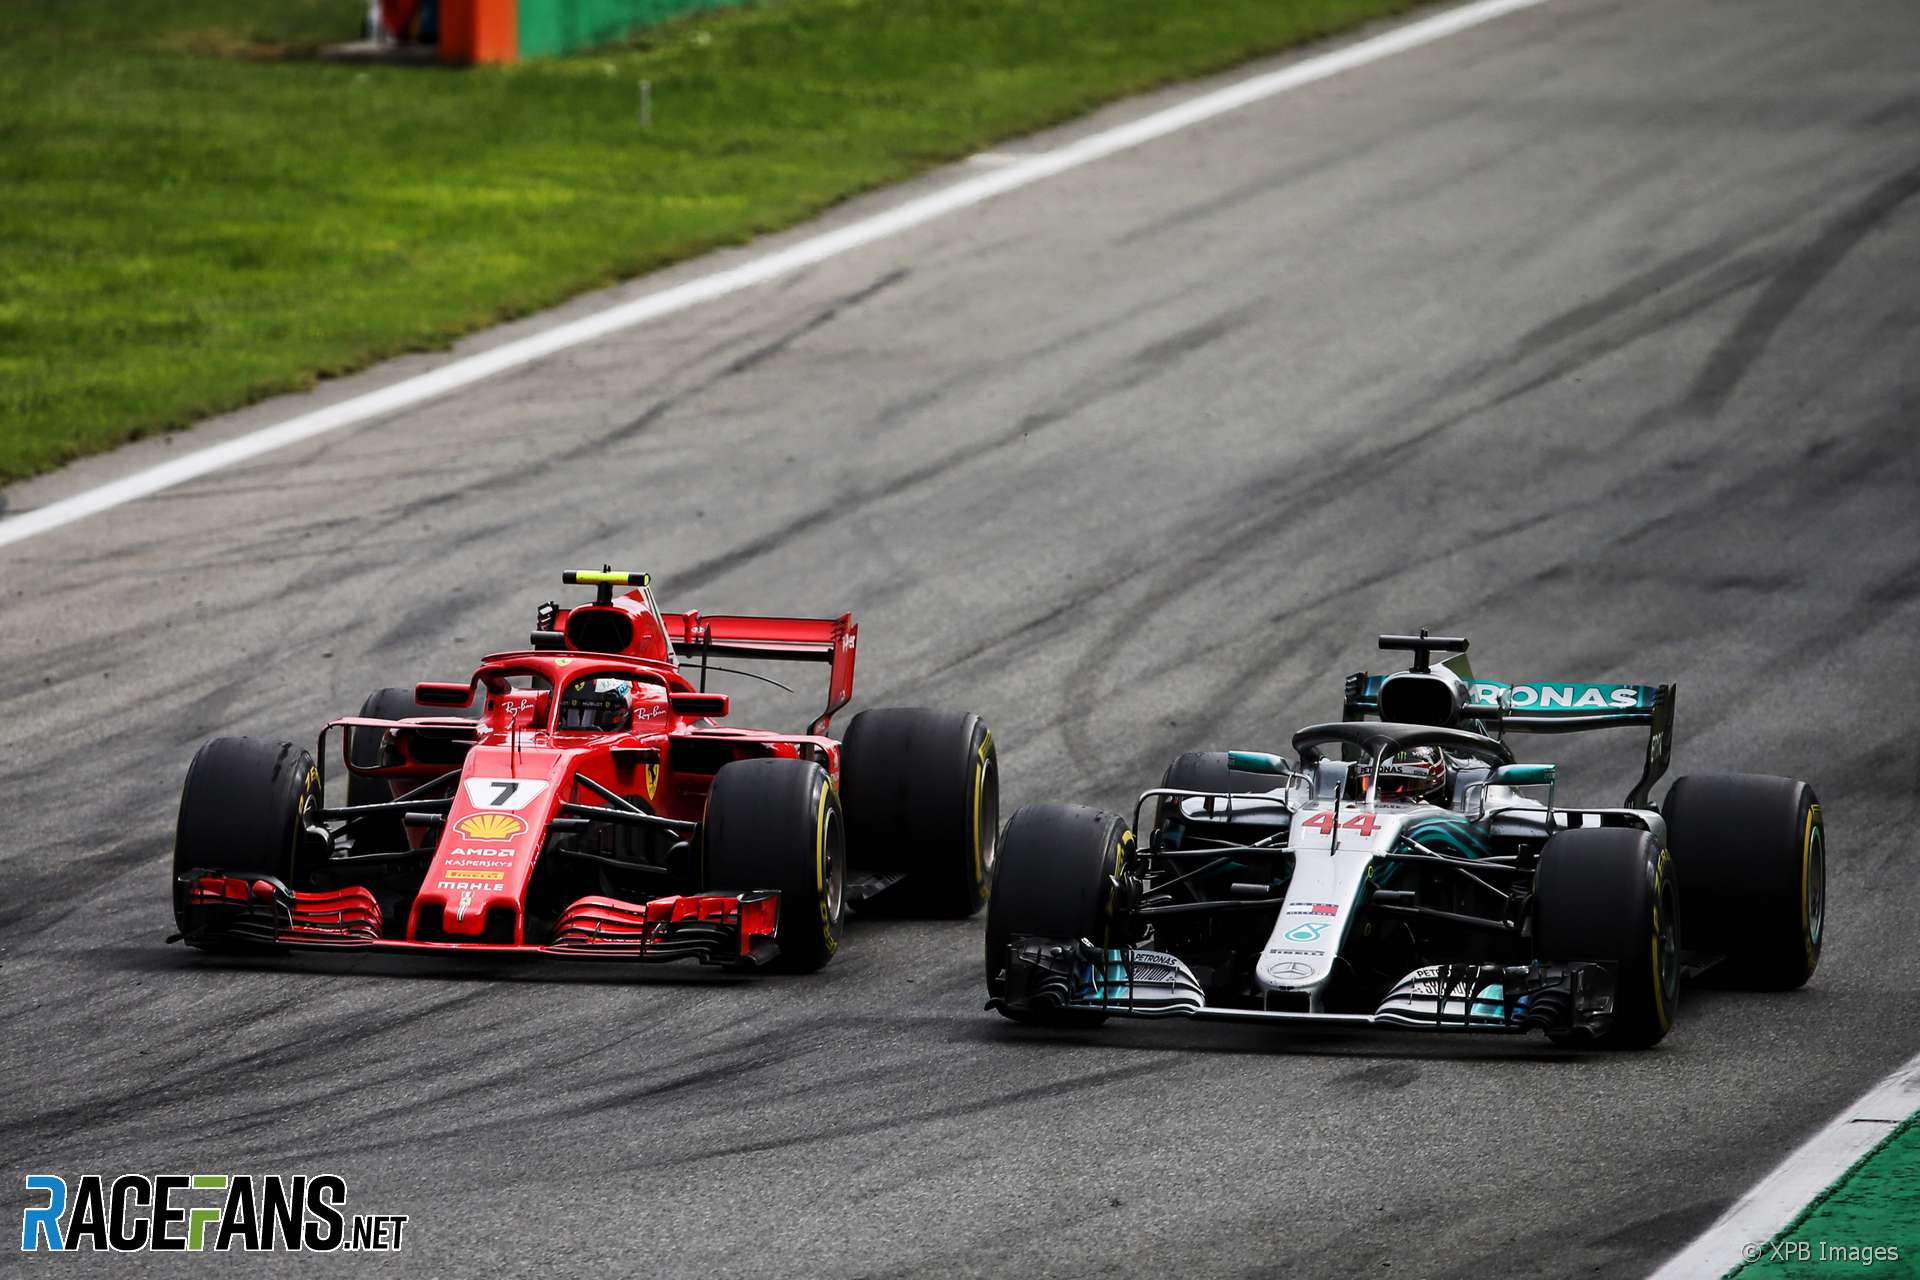 Lewis Hamilton, Kimi Raikkonen, Monza, 2018